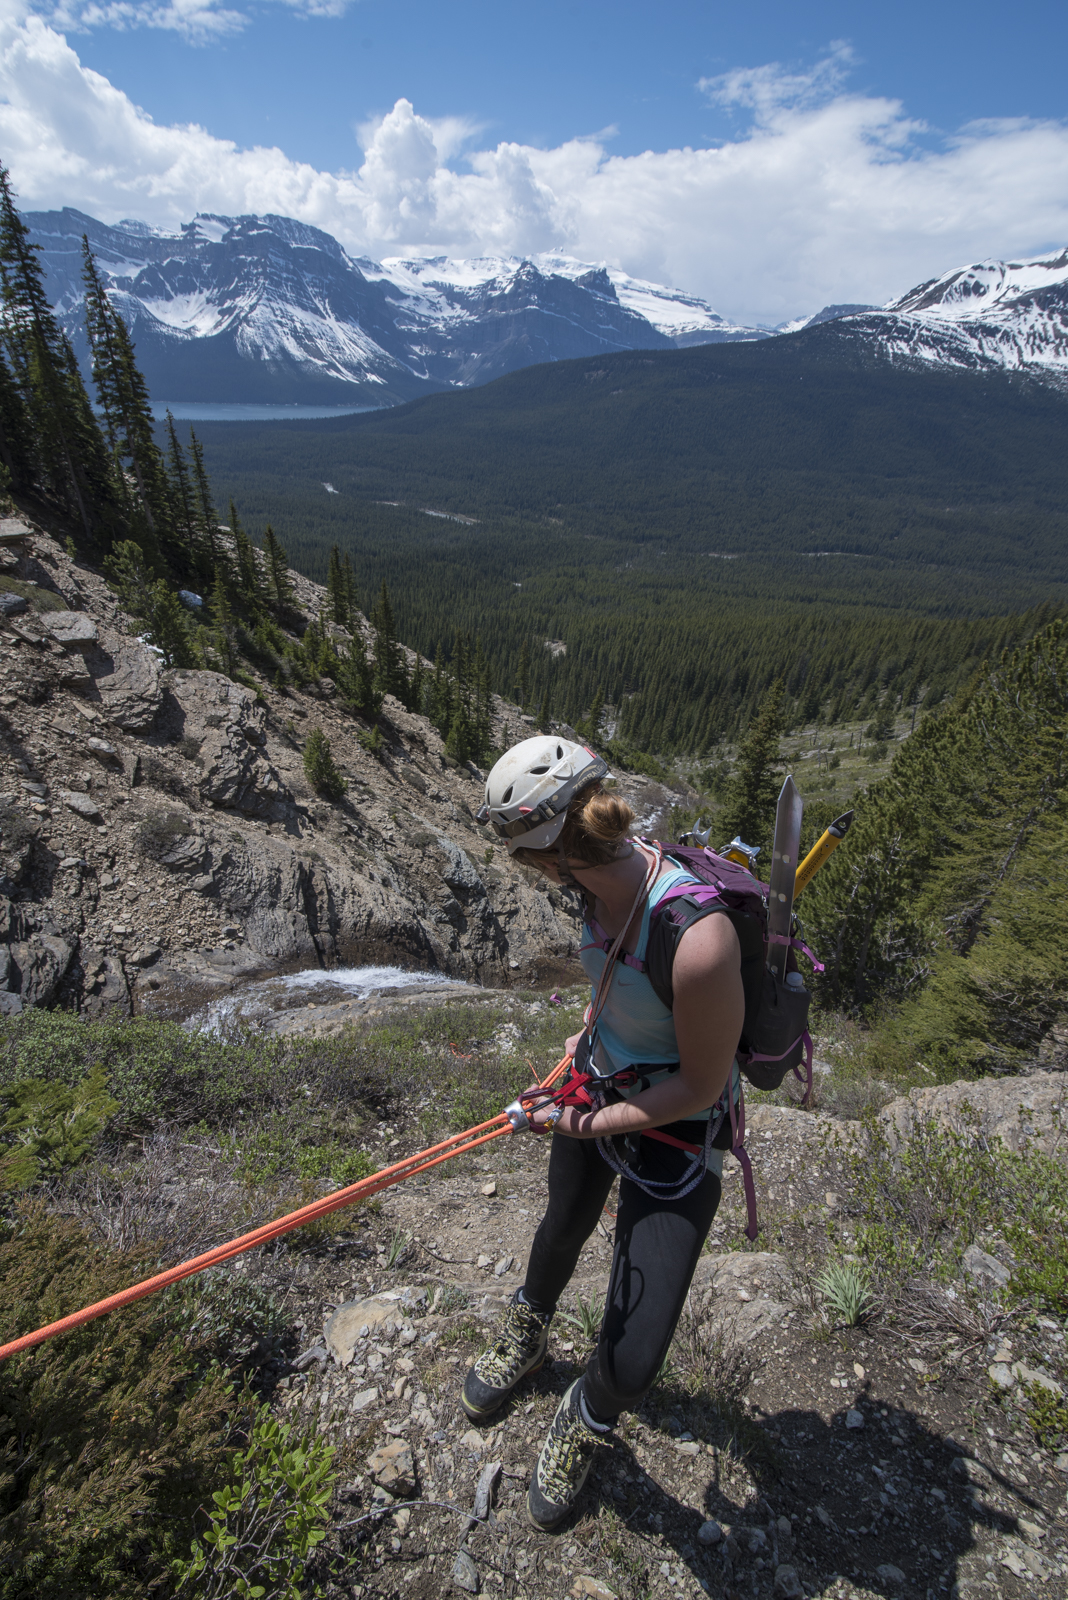 Megan repelling off Mount Hector in Banff National Park, Alberta, Canada.